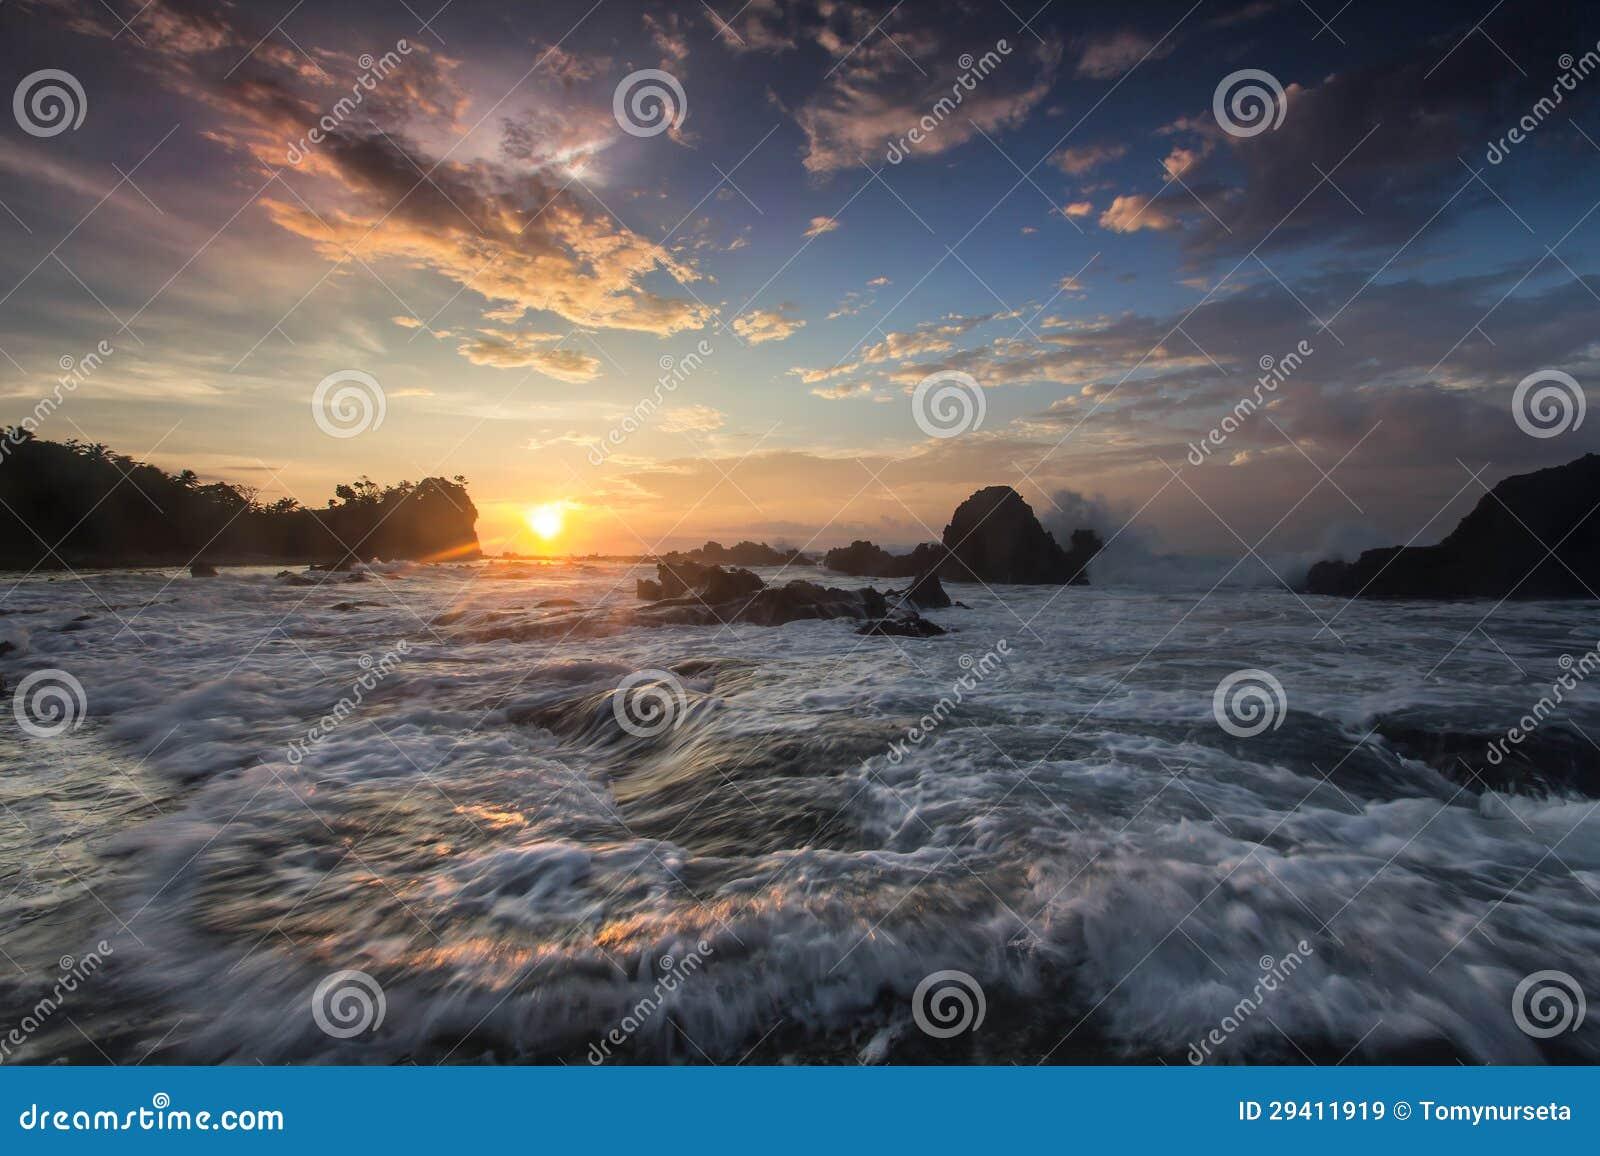 Sea view, sunrise